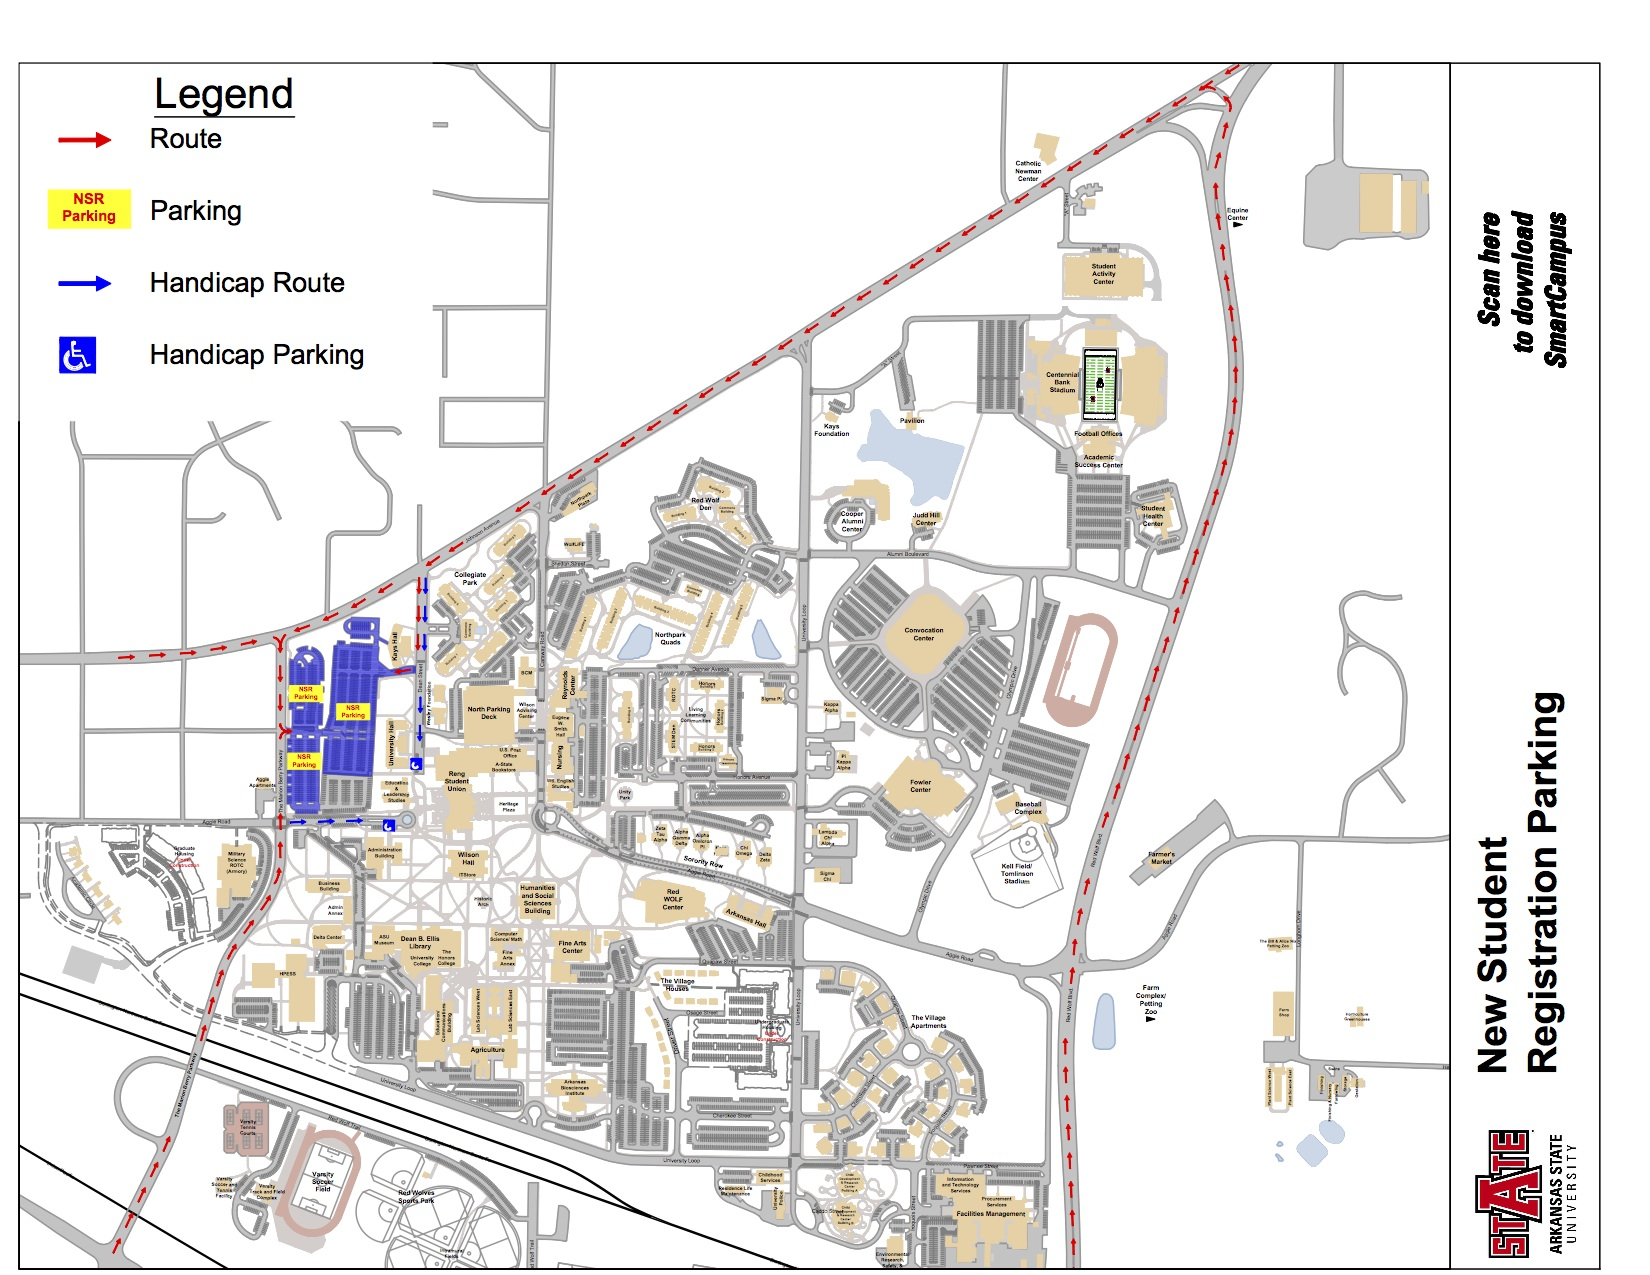 Asu Jonesboro Campus Map.Jonesboro Ar Asu Campus Map